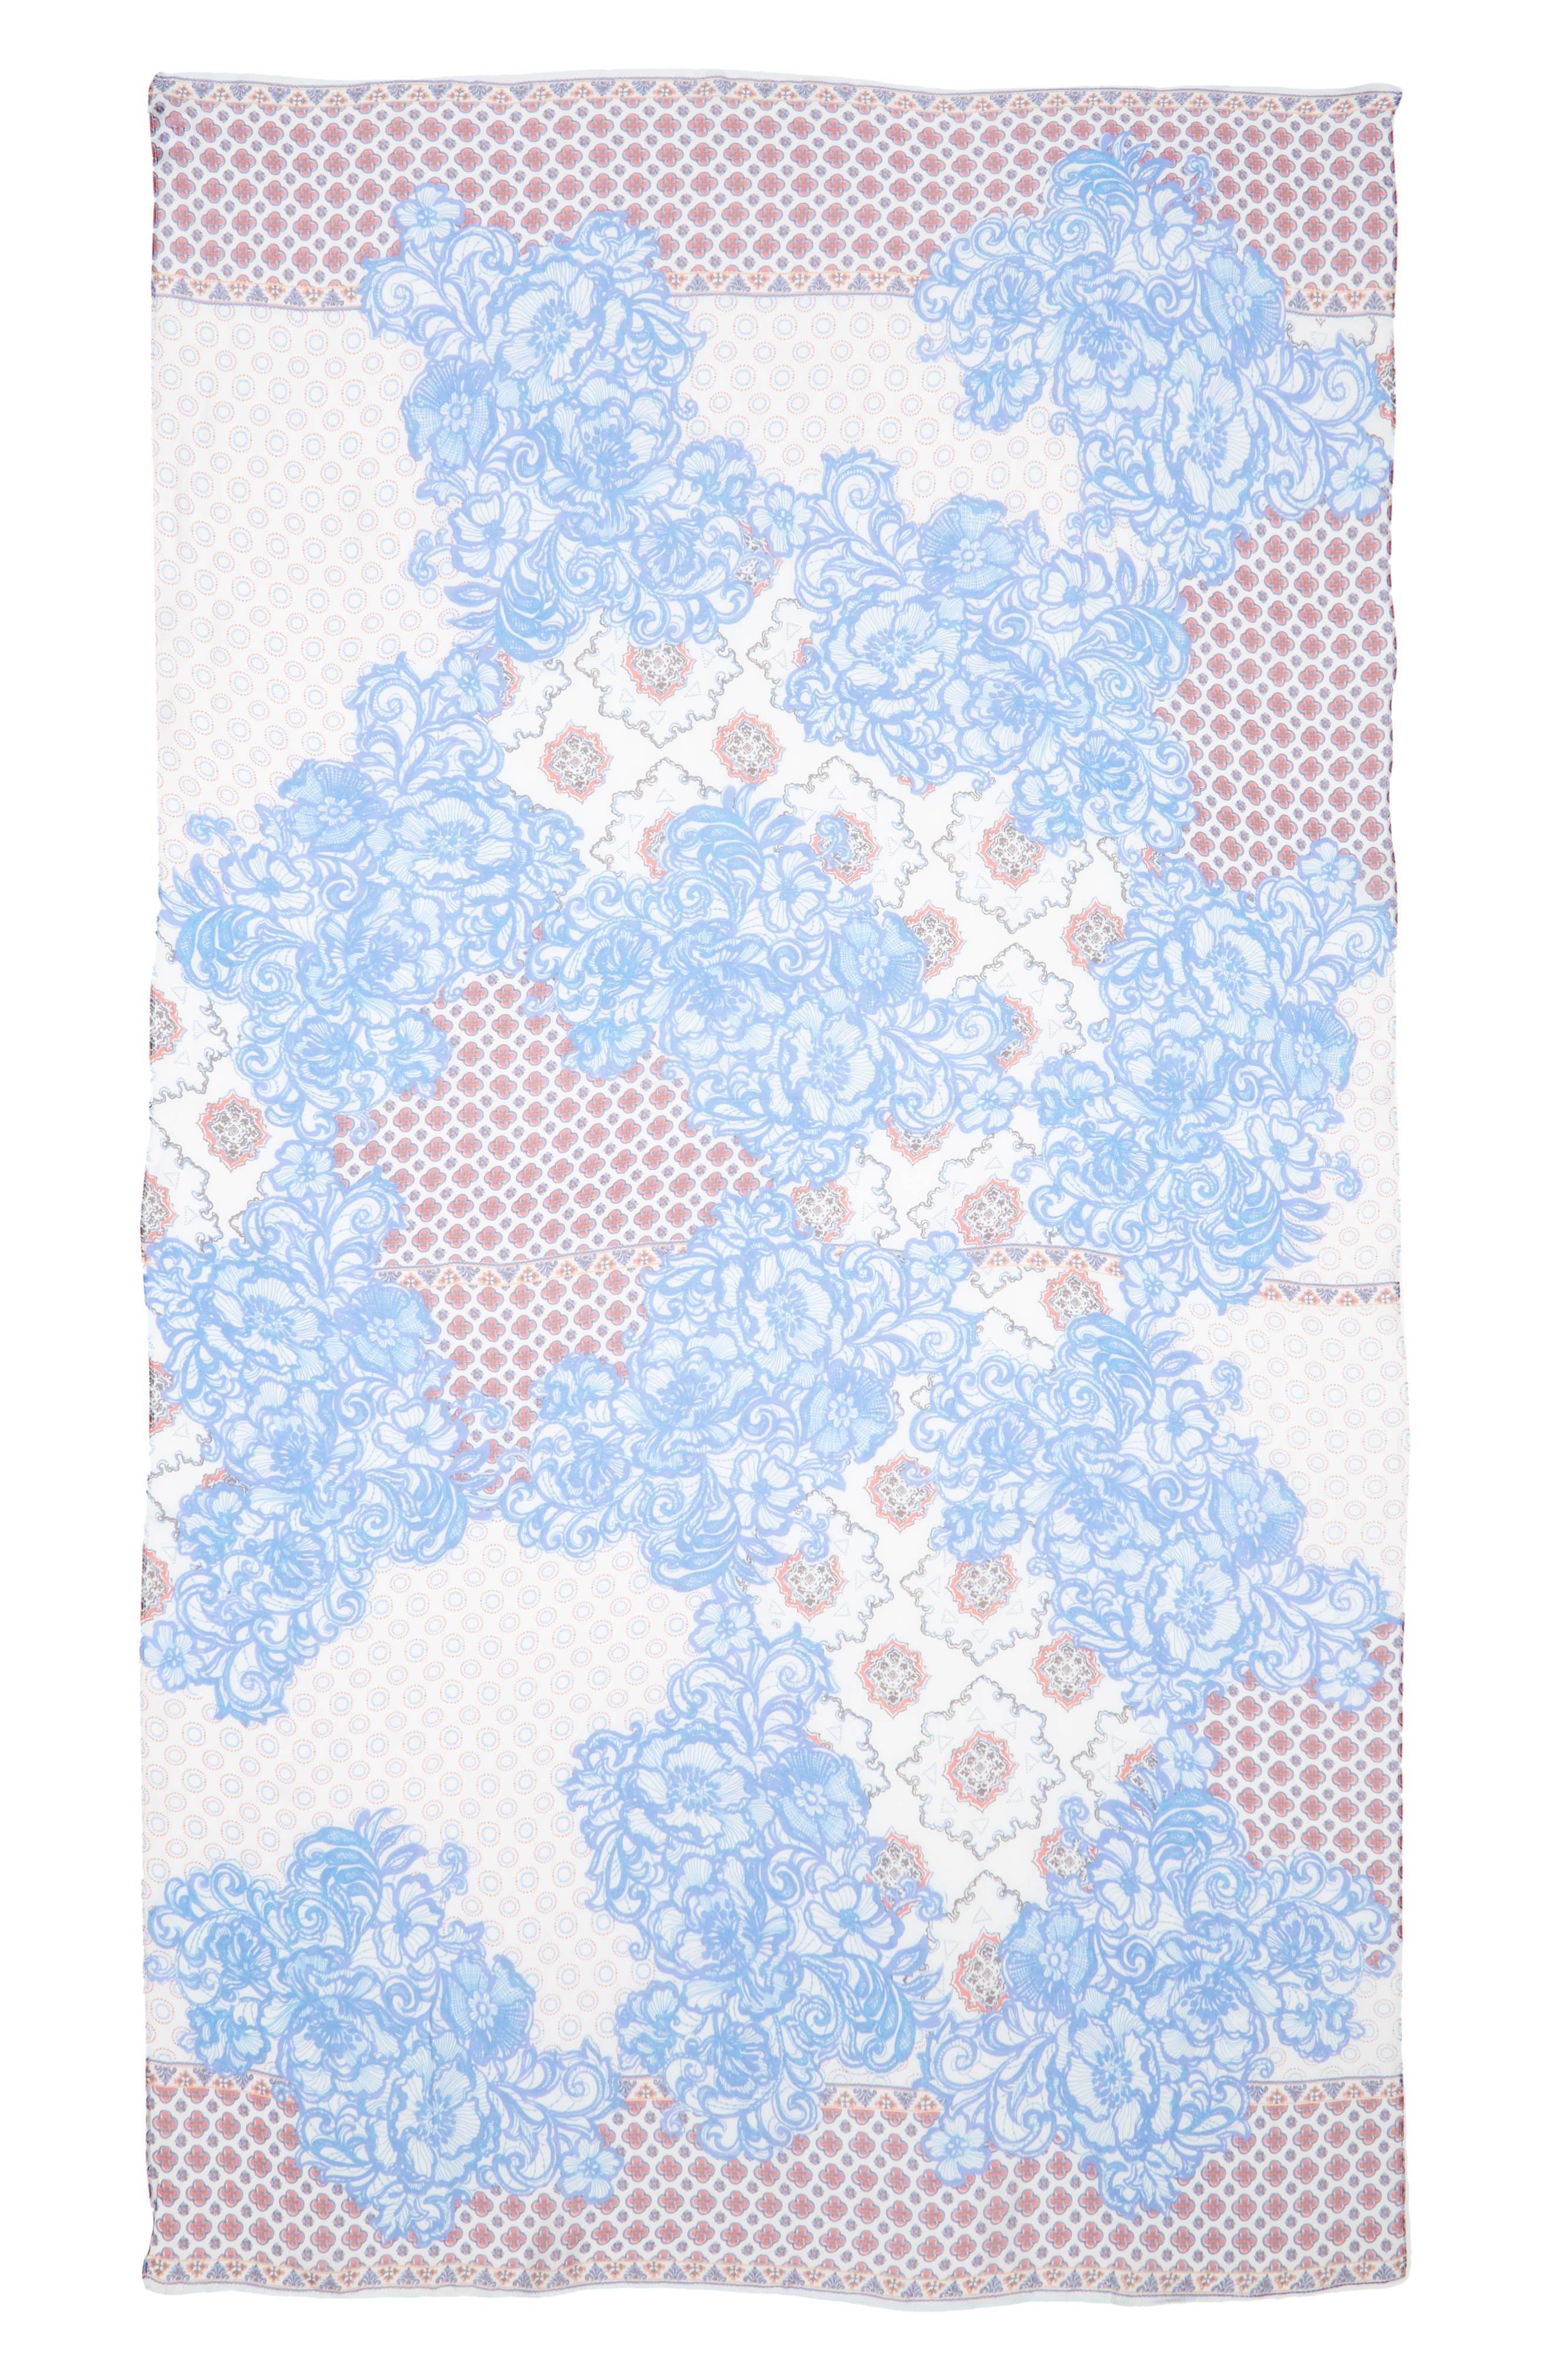 Silk Chiffon Oblong Scarf,                             Alternate thumbnail 30, color,